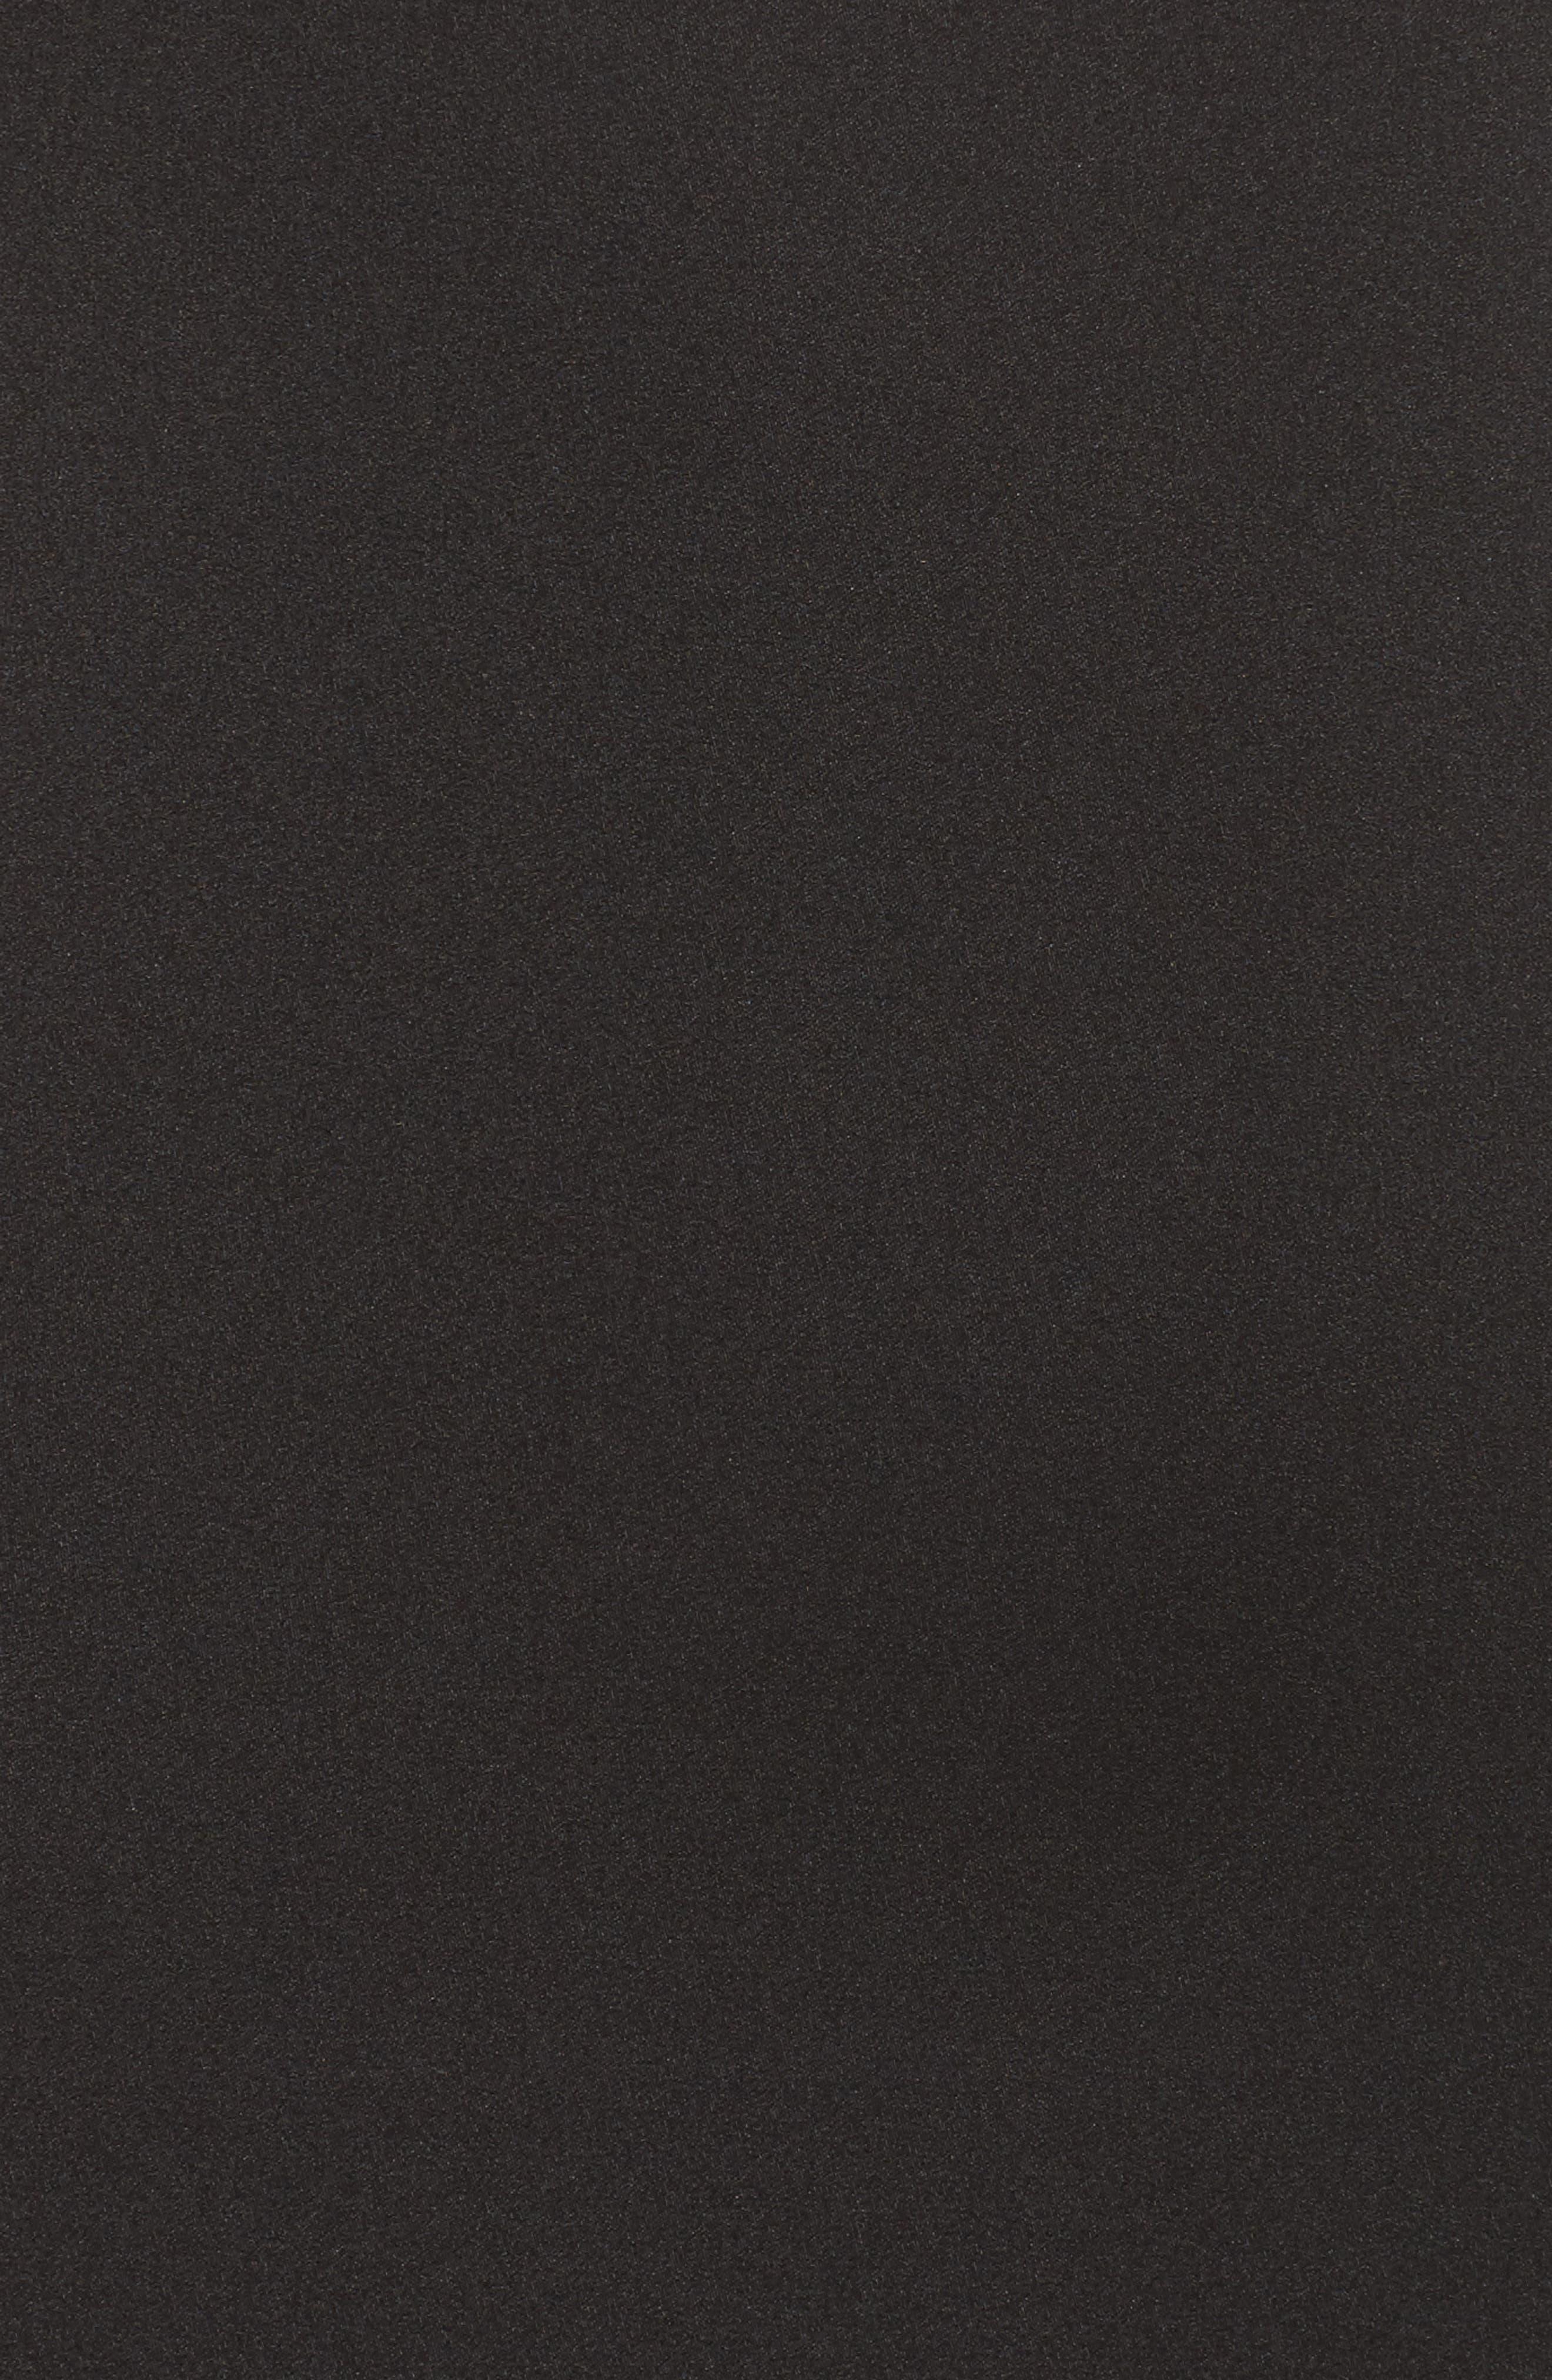 Embellished Trim Sheath Dress,                             Alternate thumbnail 5, color,                             Black